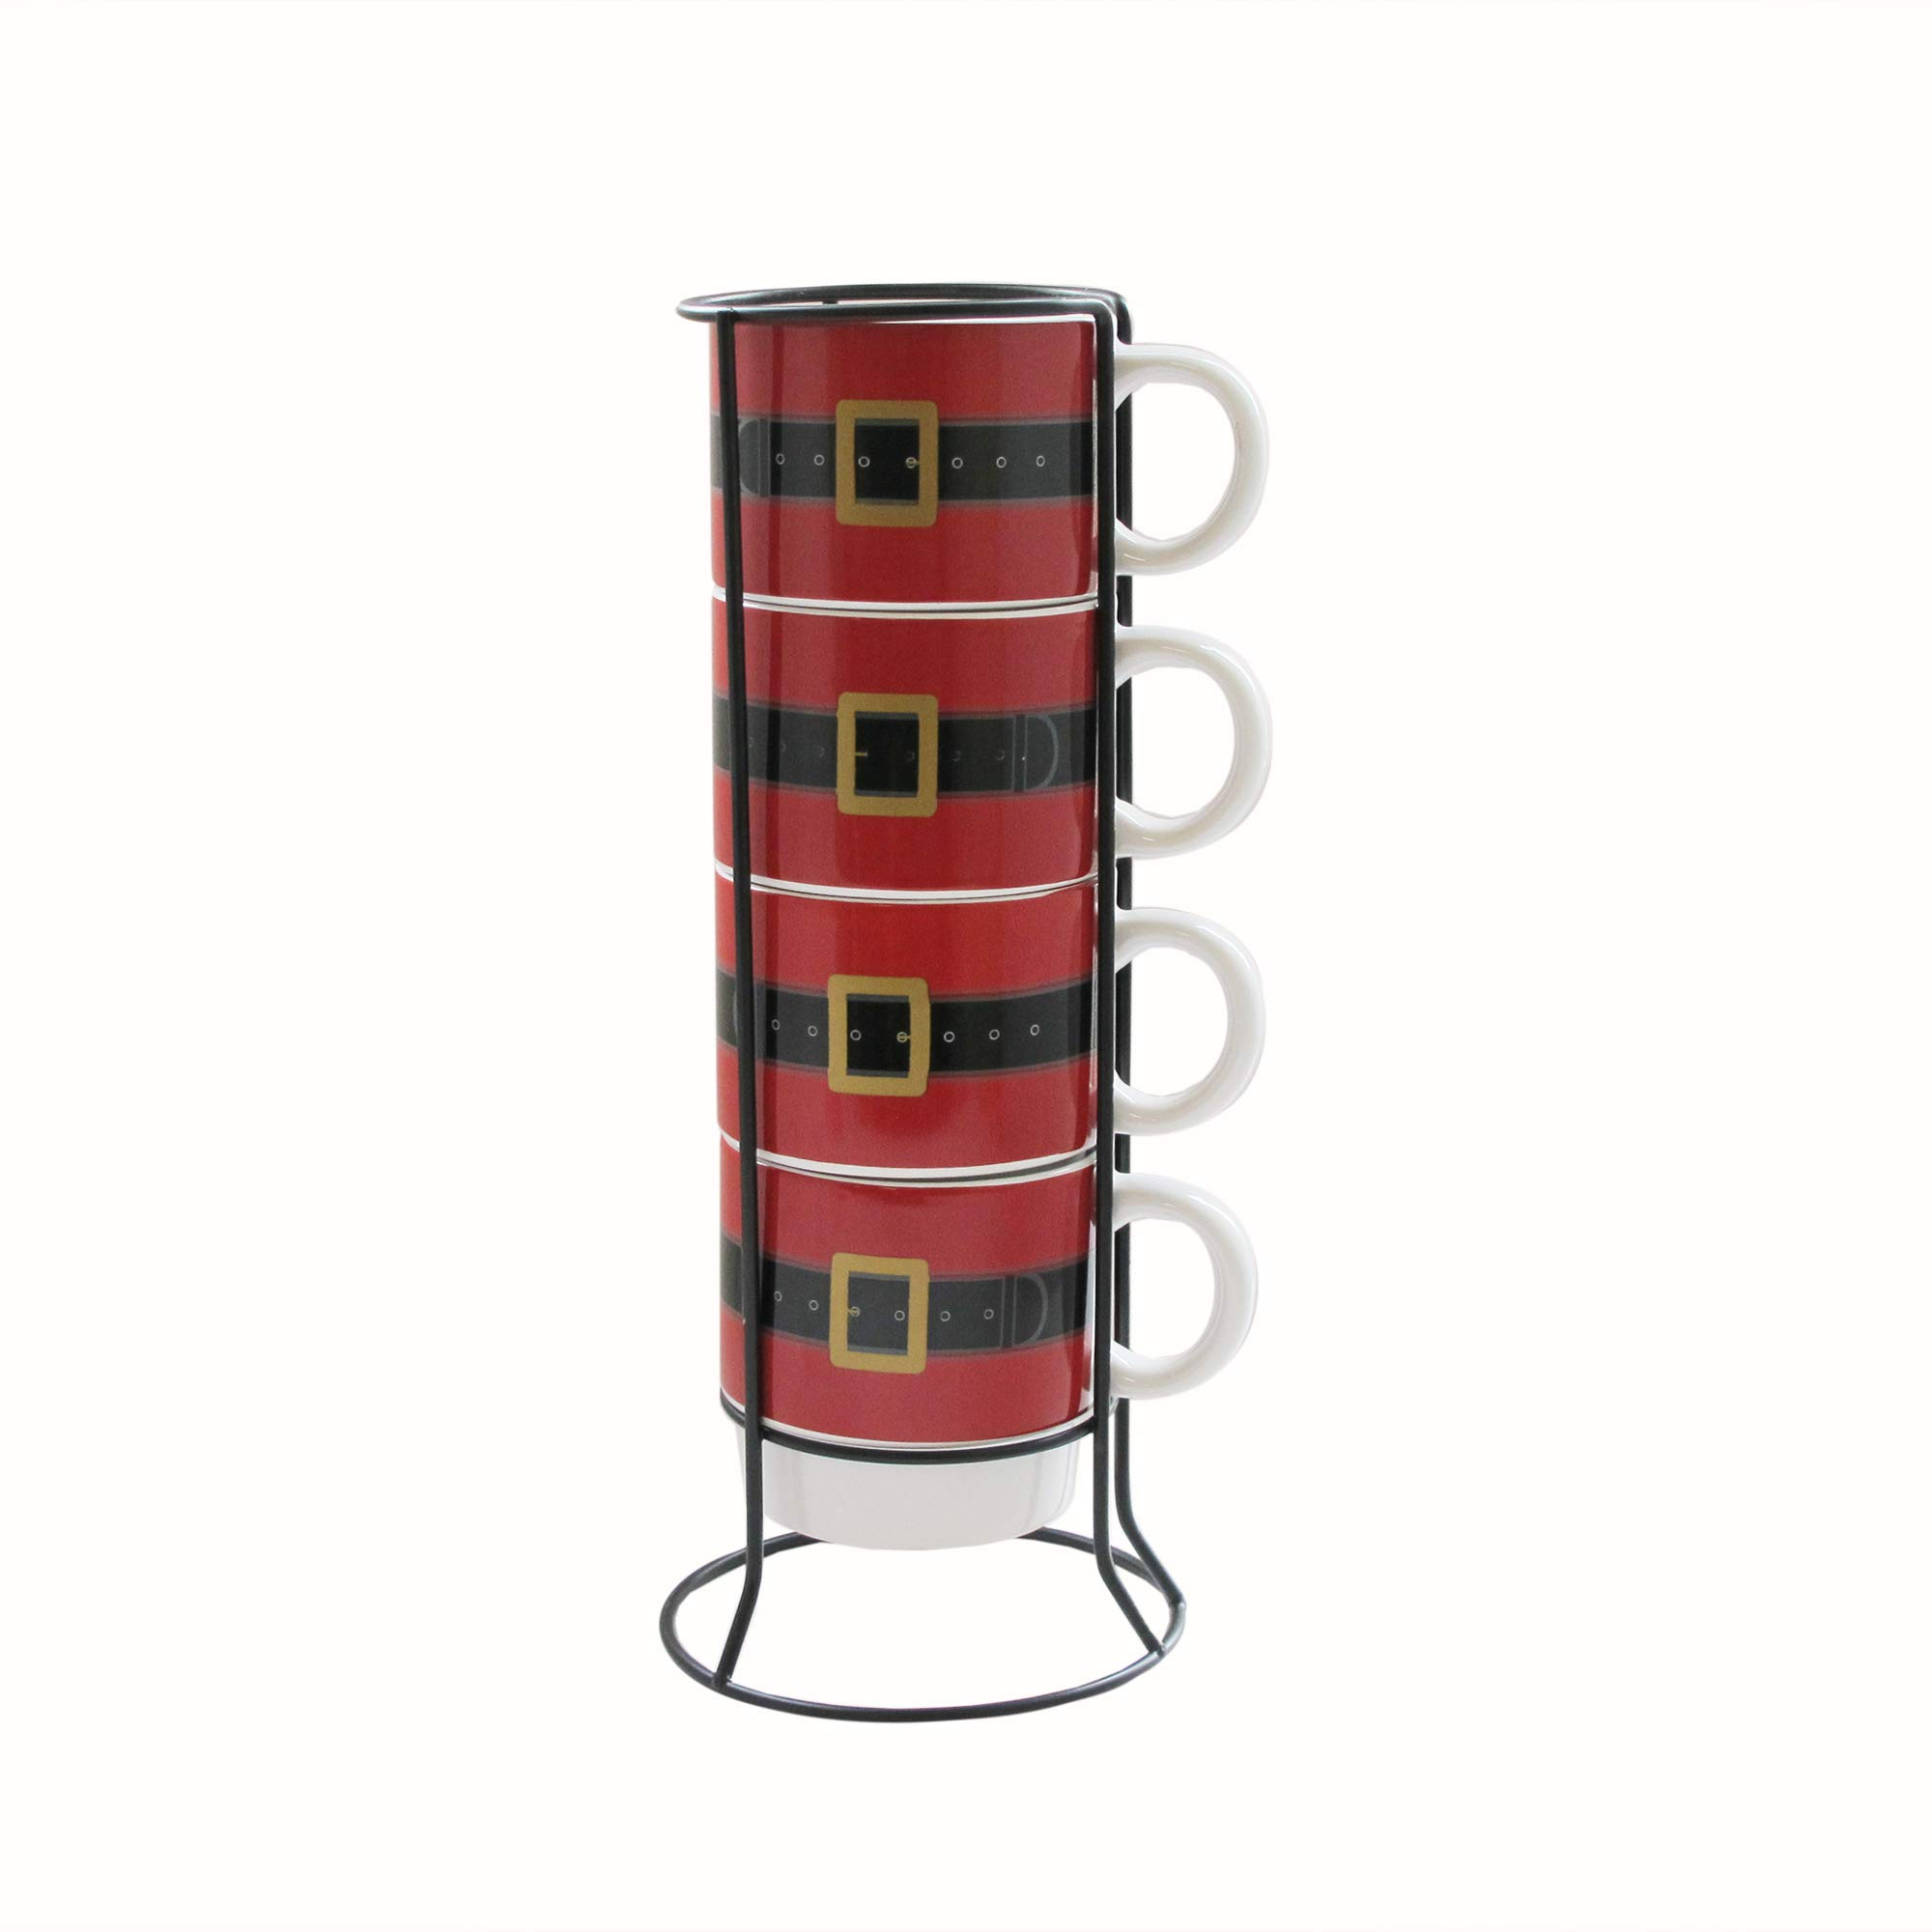 American Atelier 7429-5MRRB Ceramic Mug & Rack Set – 4 Cups & Standing Metal Rack for Kitchen Countertop, Island, or Café Display – Gift for Tea & Coffee Lovers – Holiday Design, 14 oz, Santa's Belt